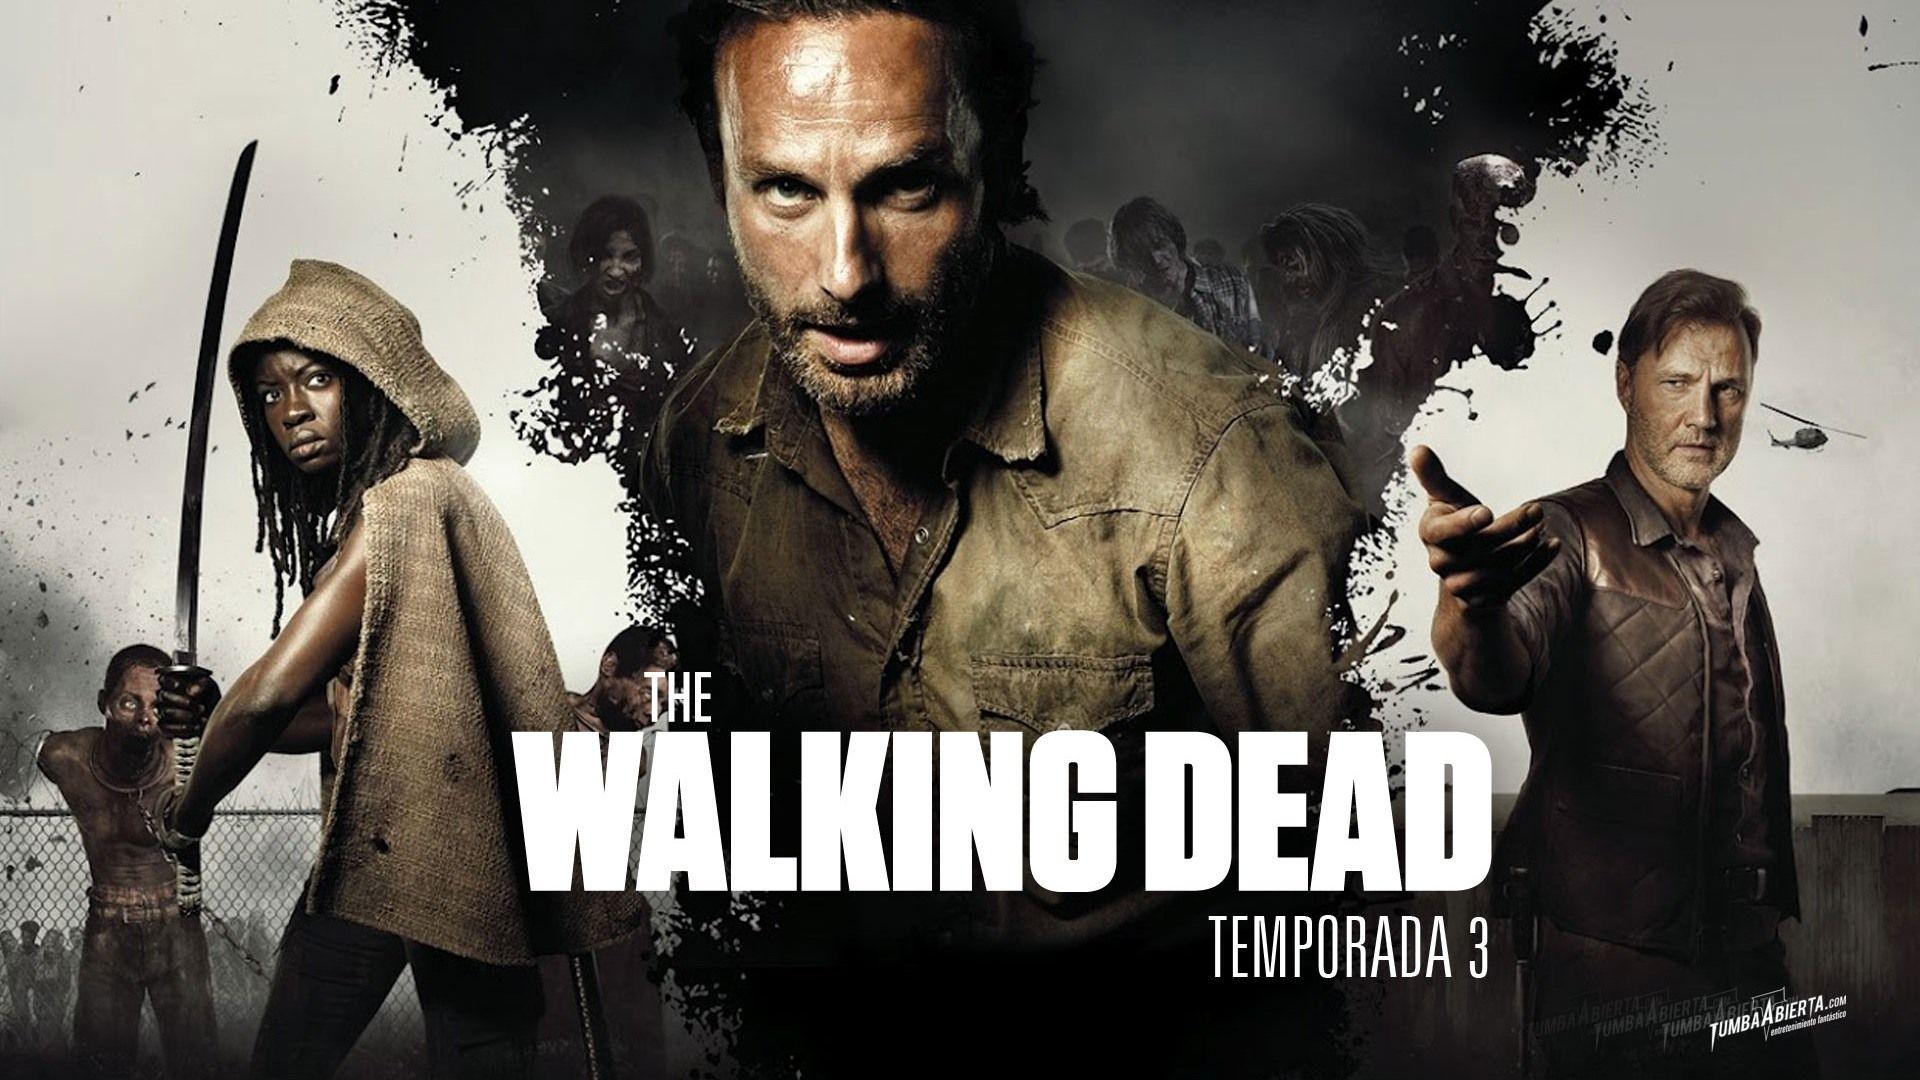 The Walking Dead HD Wallpapers Backgrounds Wallpaper 1920x1080 38